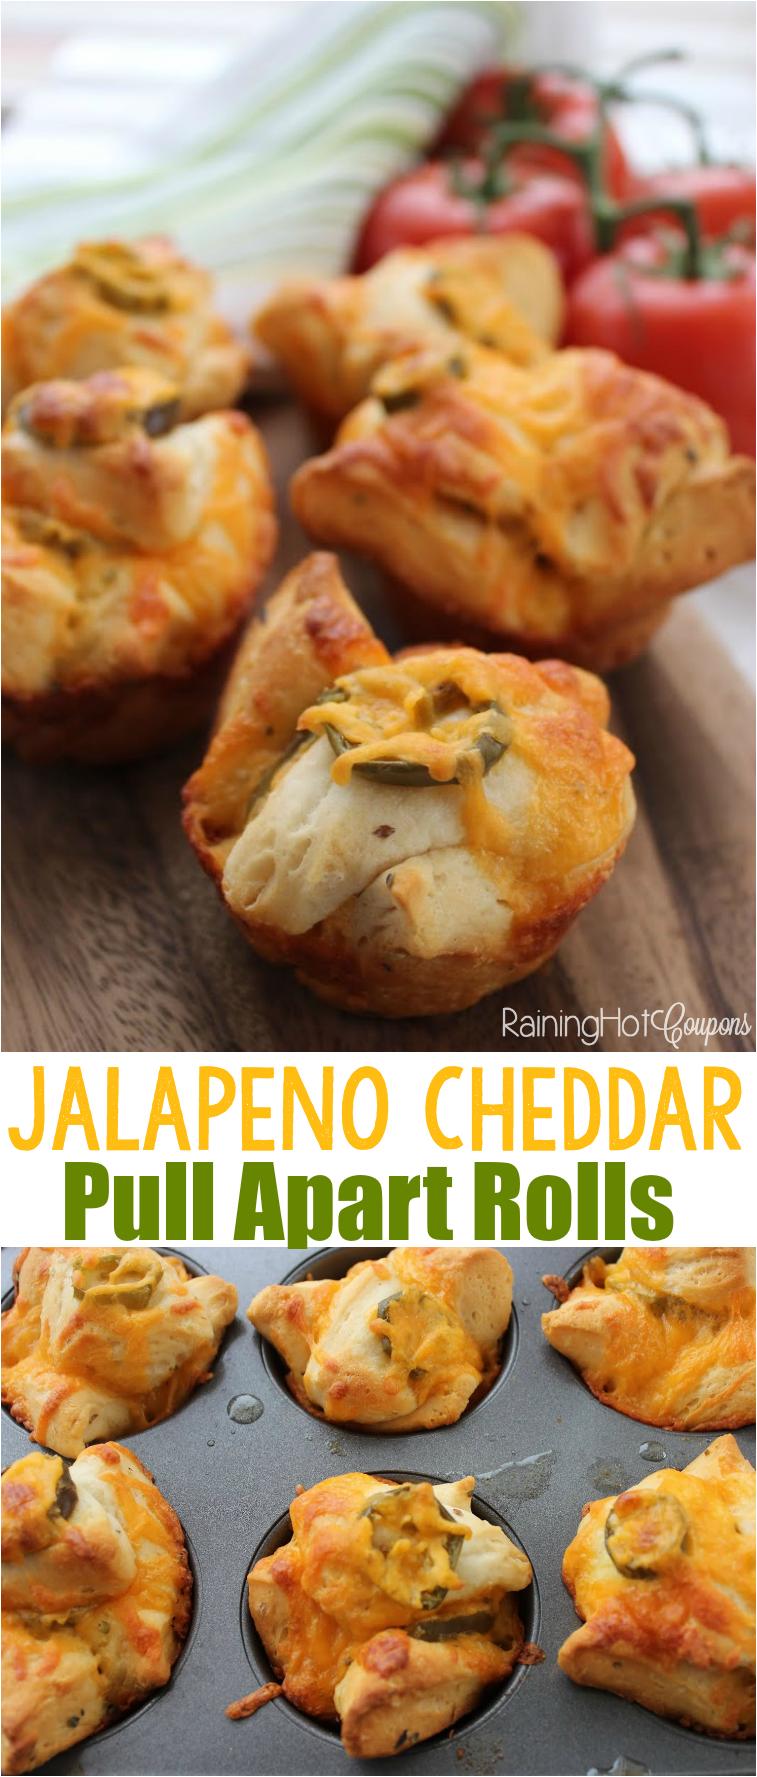 Pull Apart Rolls